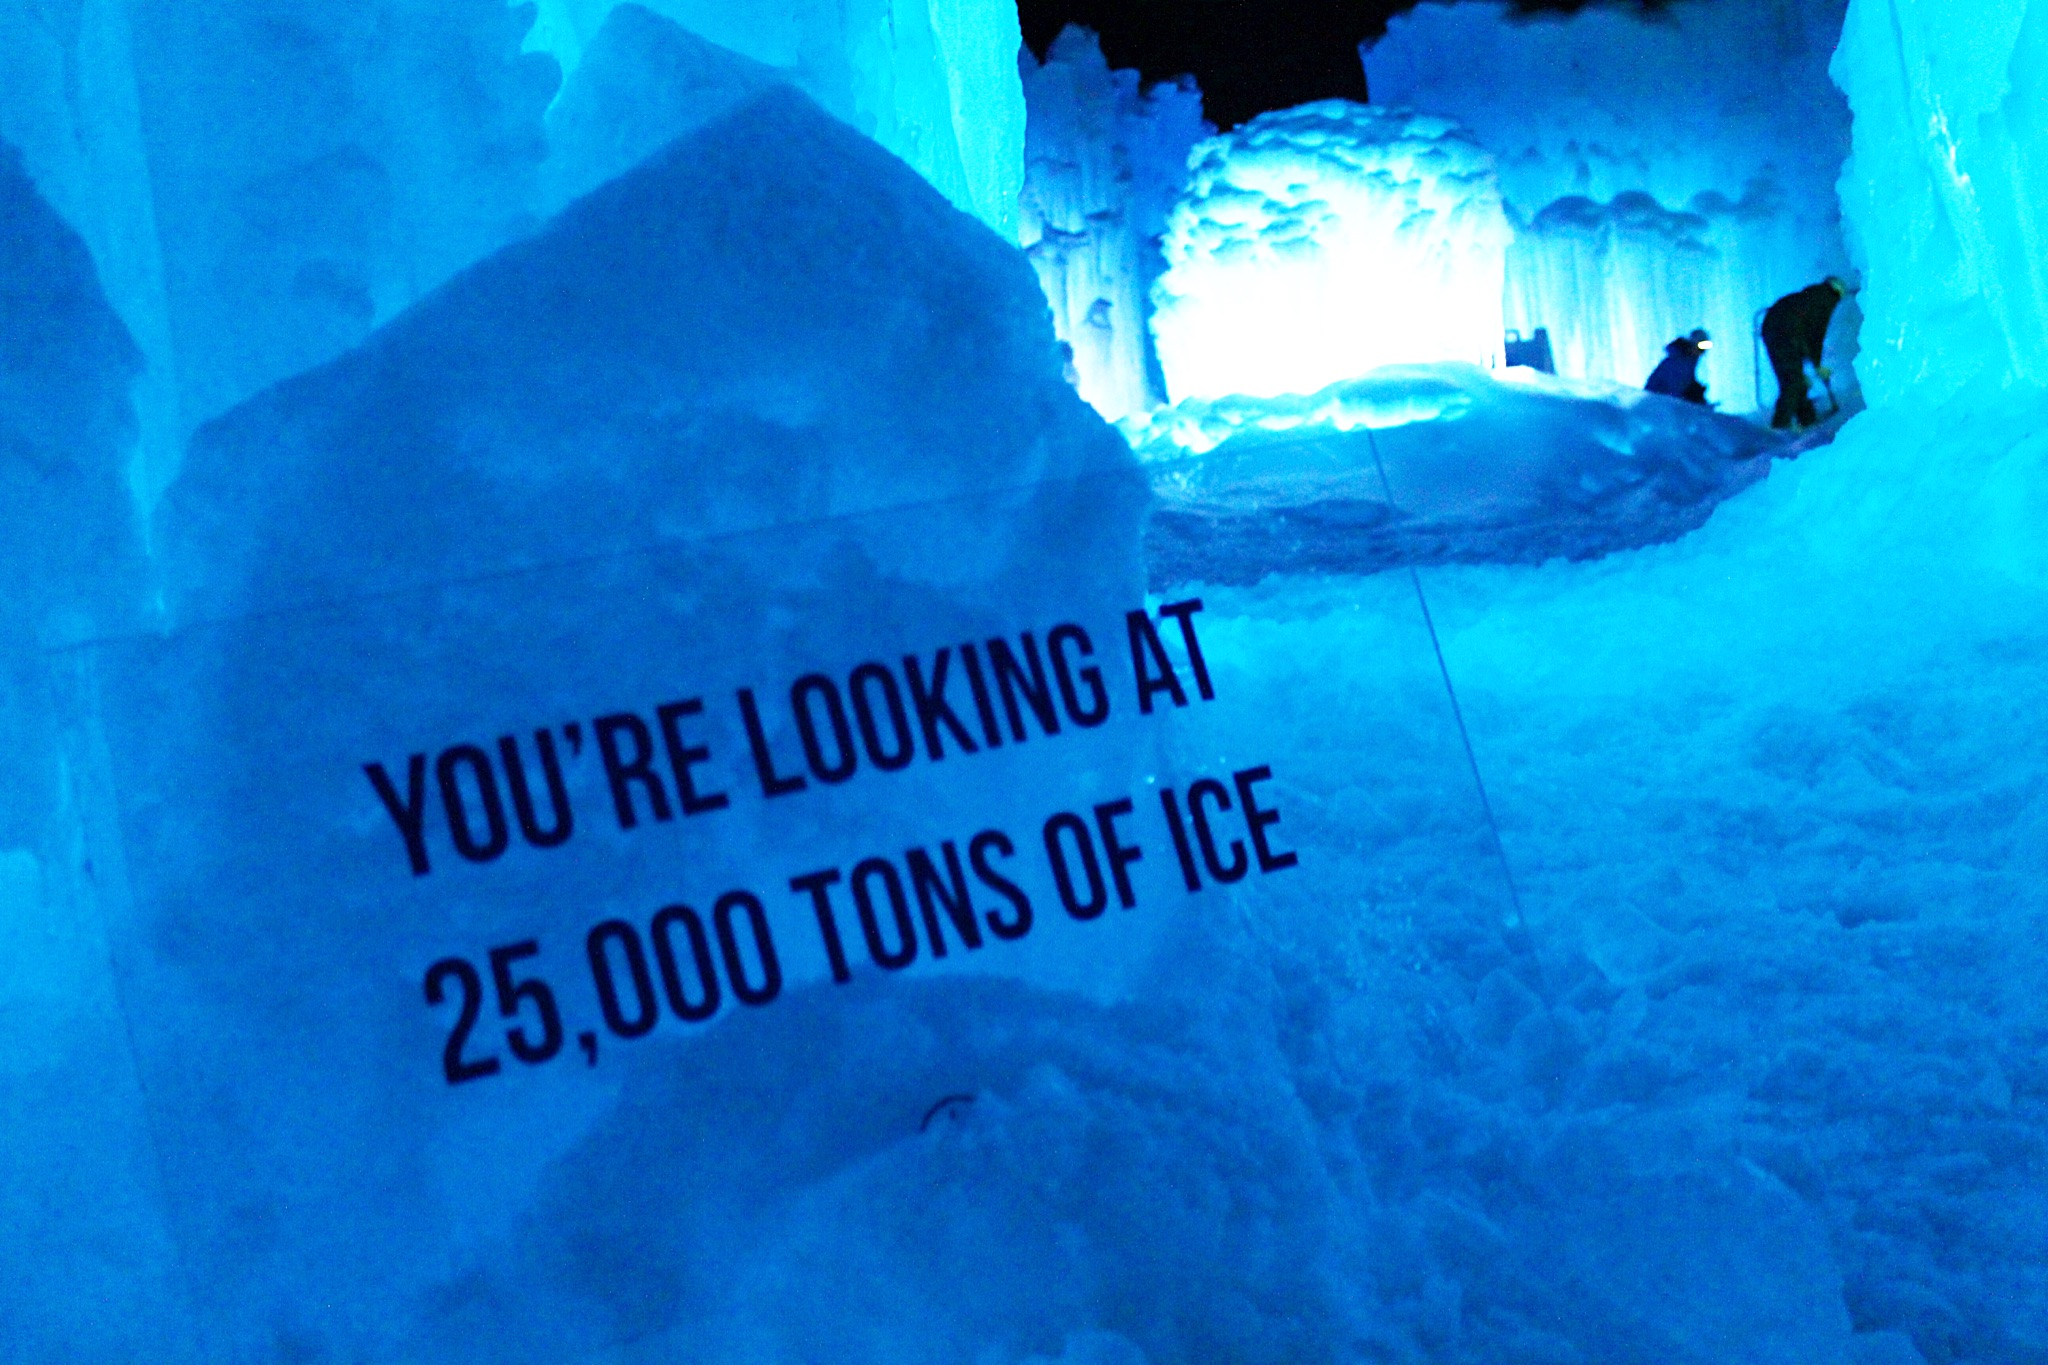 25k-tons-of-ice.jpg